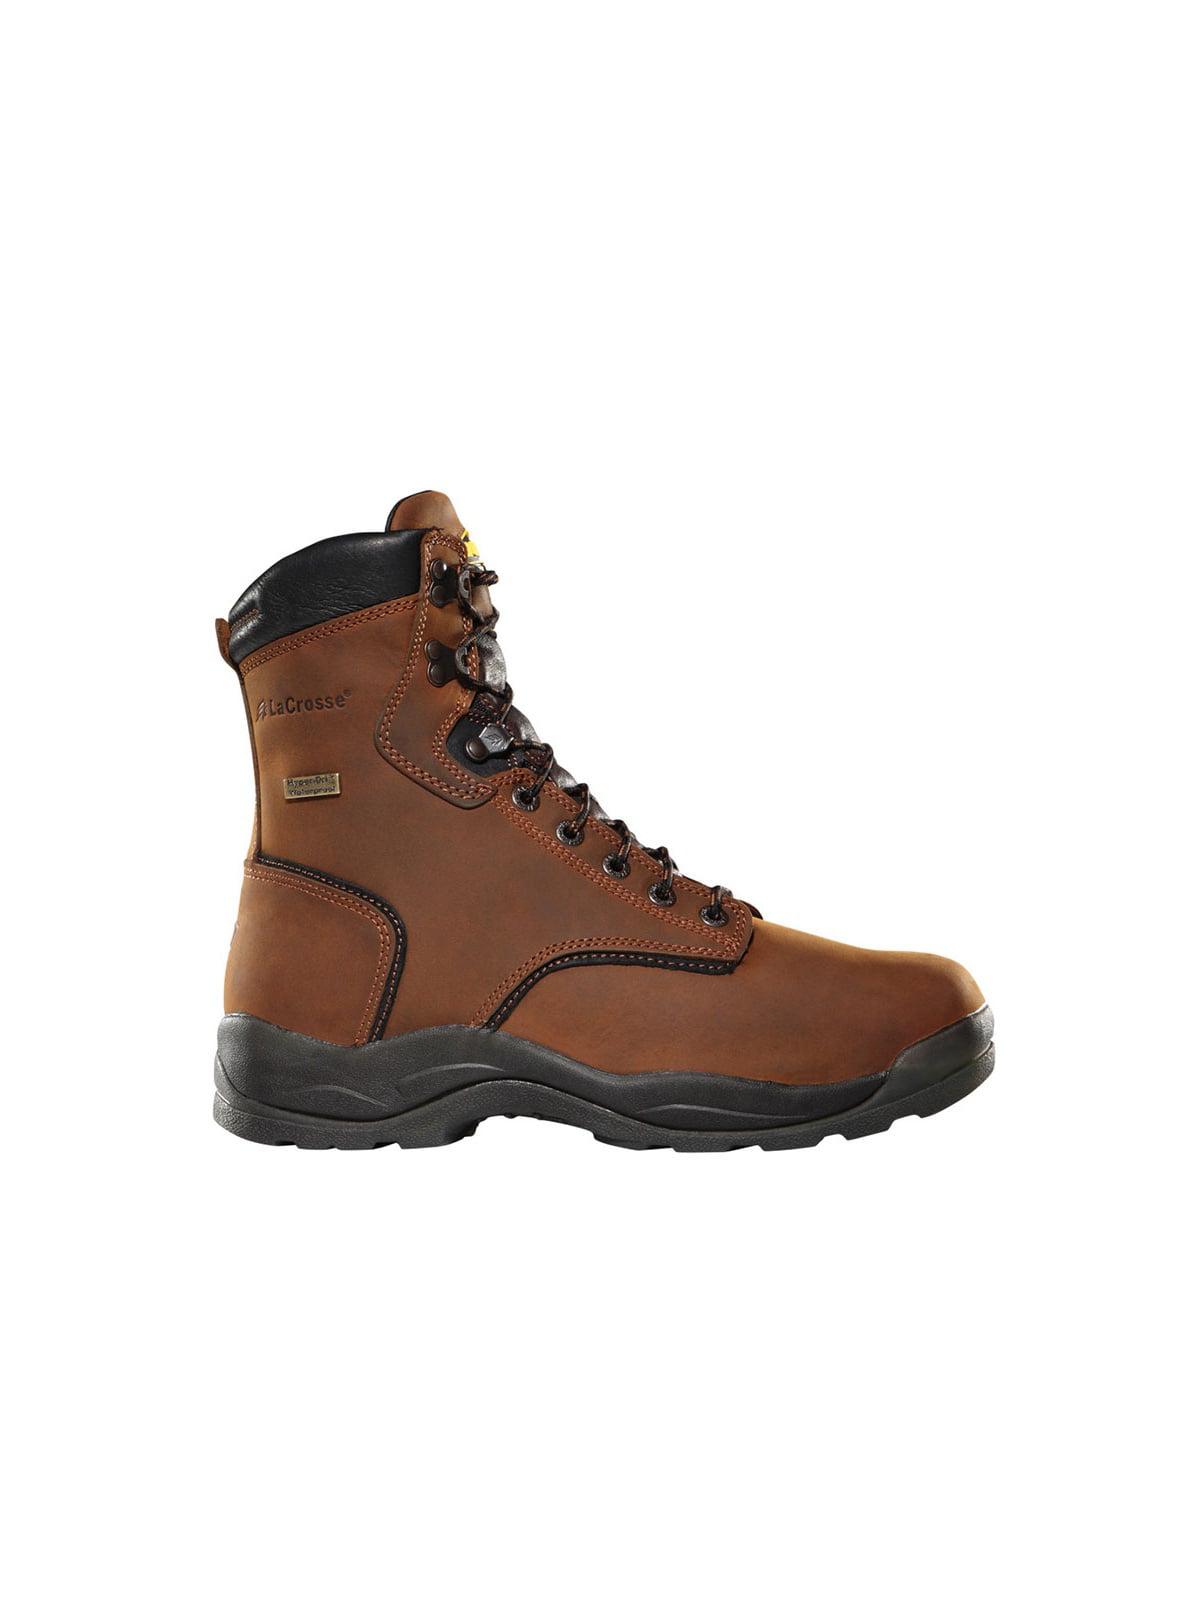 LaCrosse Mens Quad Comfort 4 x 8 Dry Core Brown Work Boots 480001 by LACROSSE